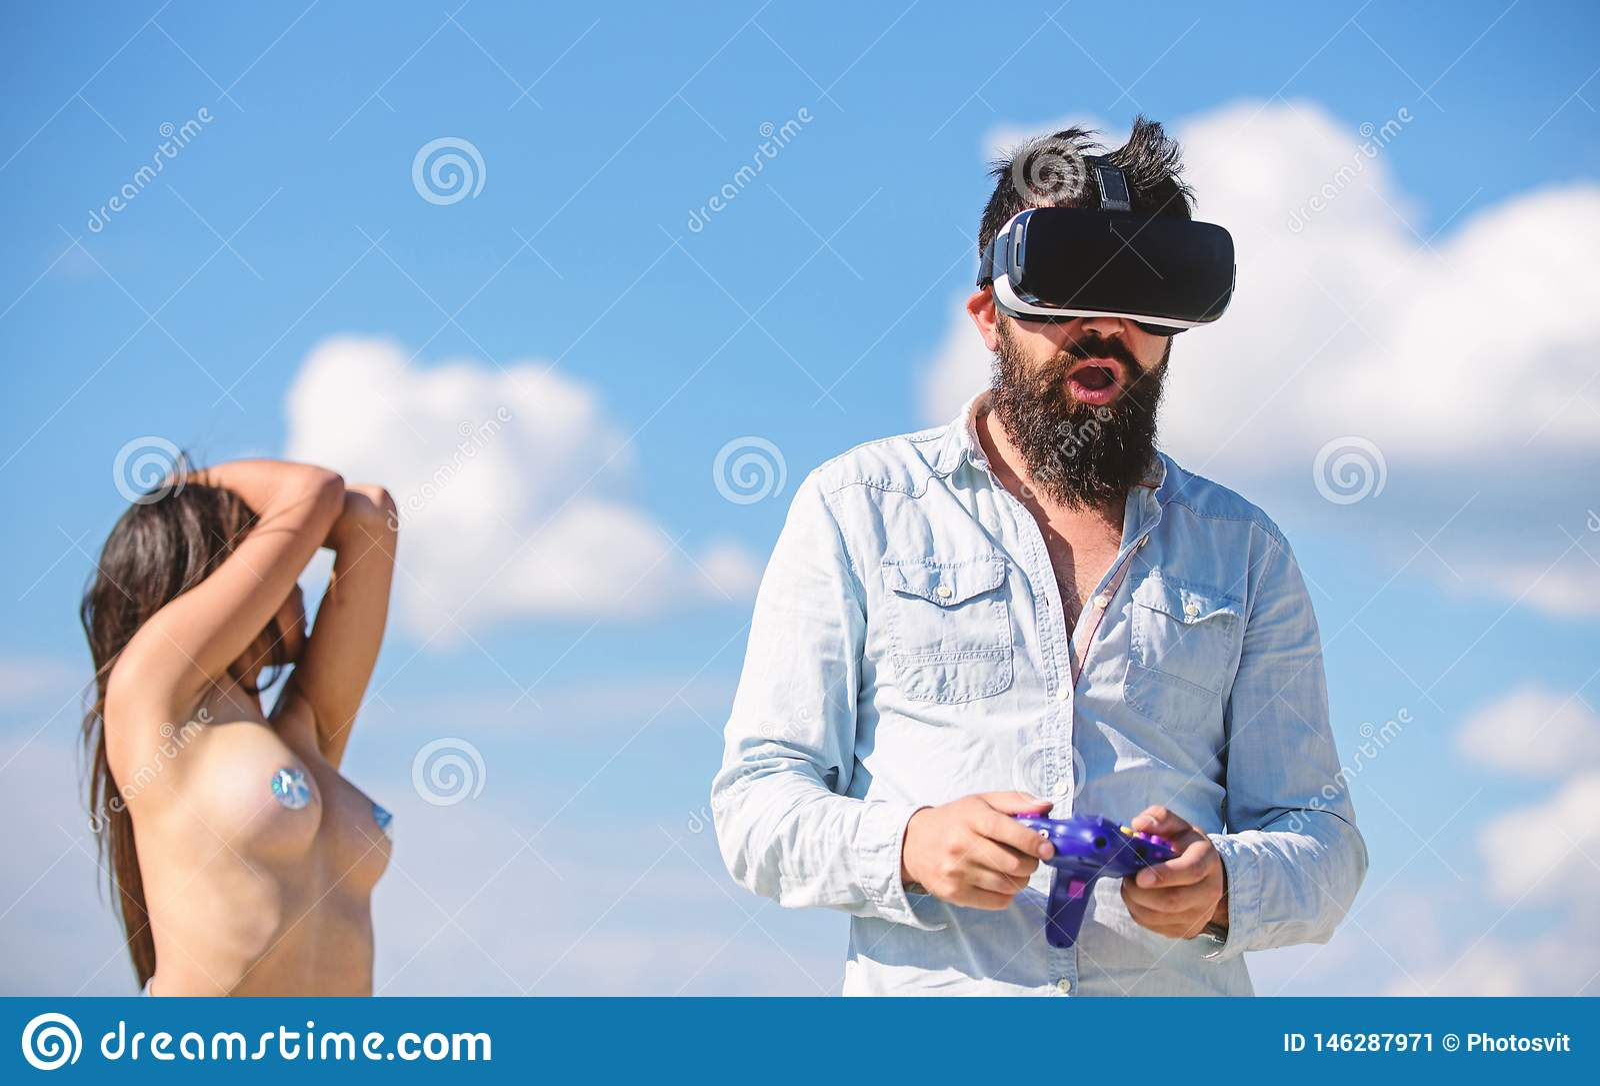 Sex glasses game